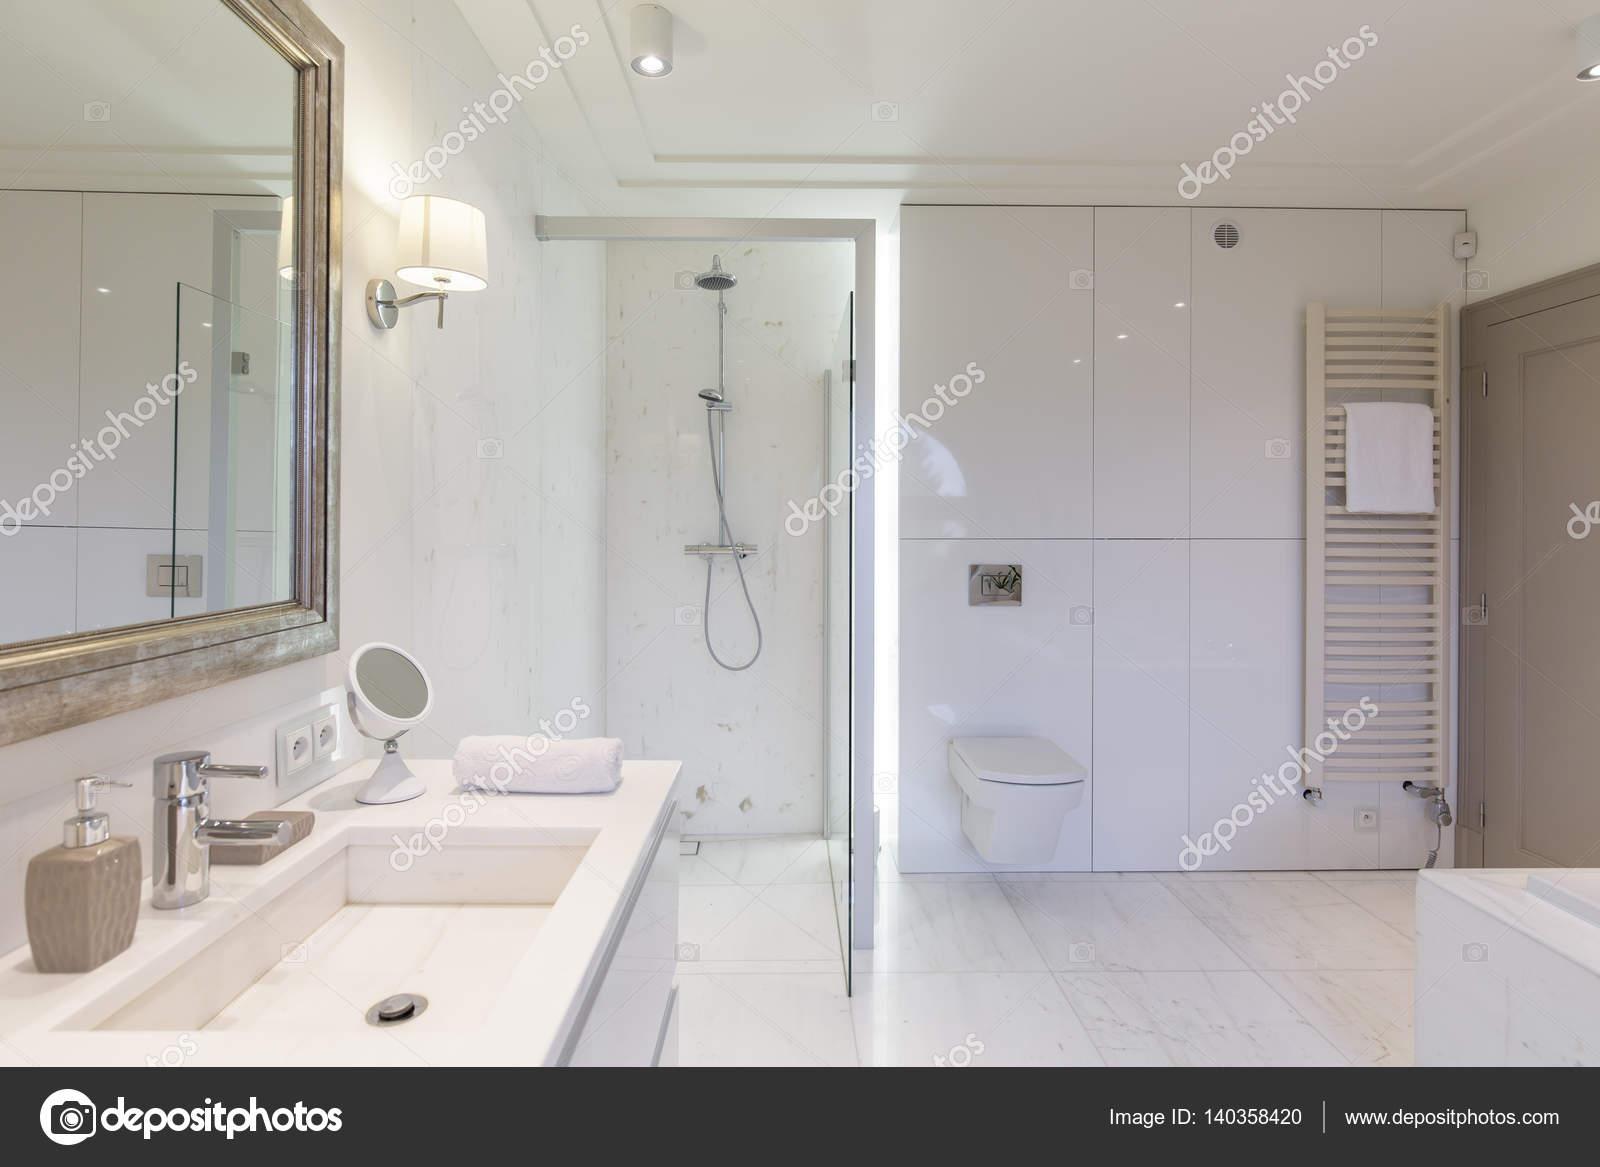 moderne badkamer met glazen douchecabine — Stockfoto © photographee ...